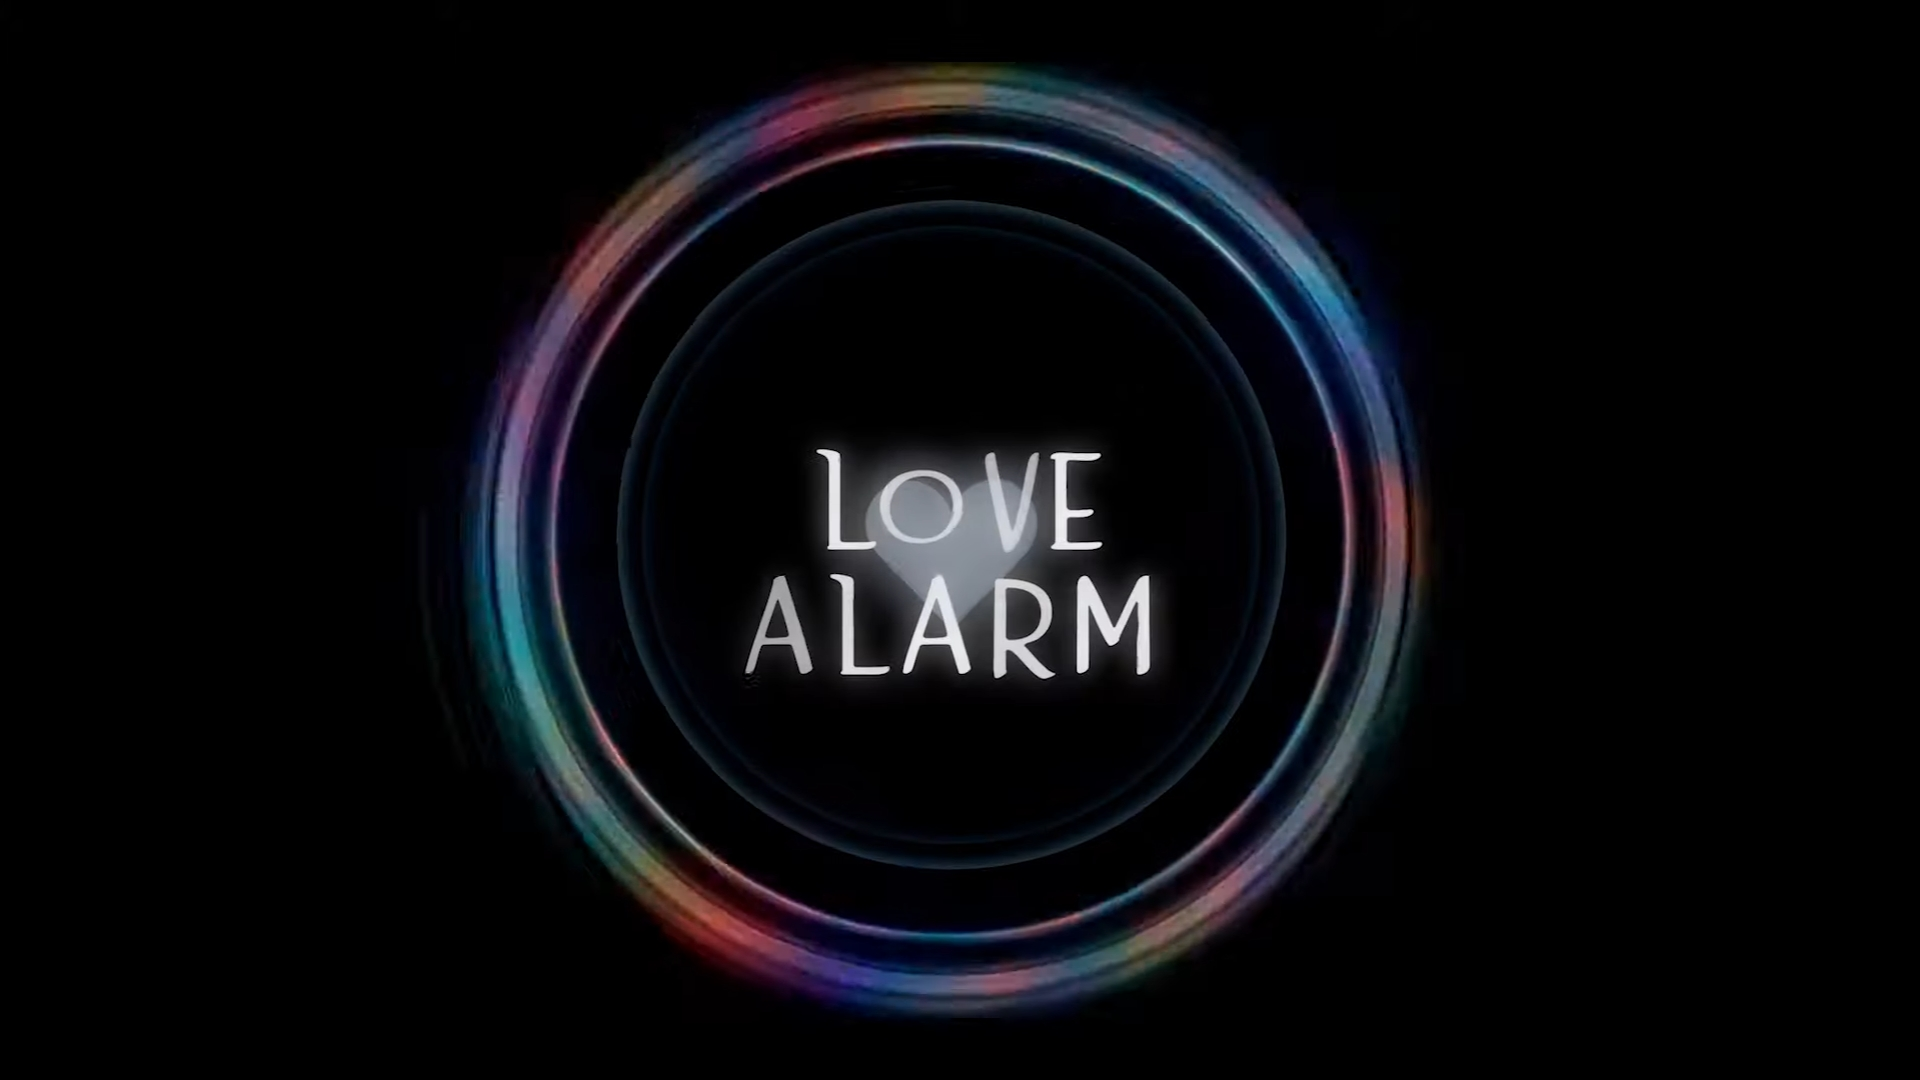 LOVEALARM